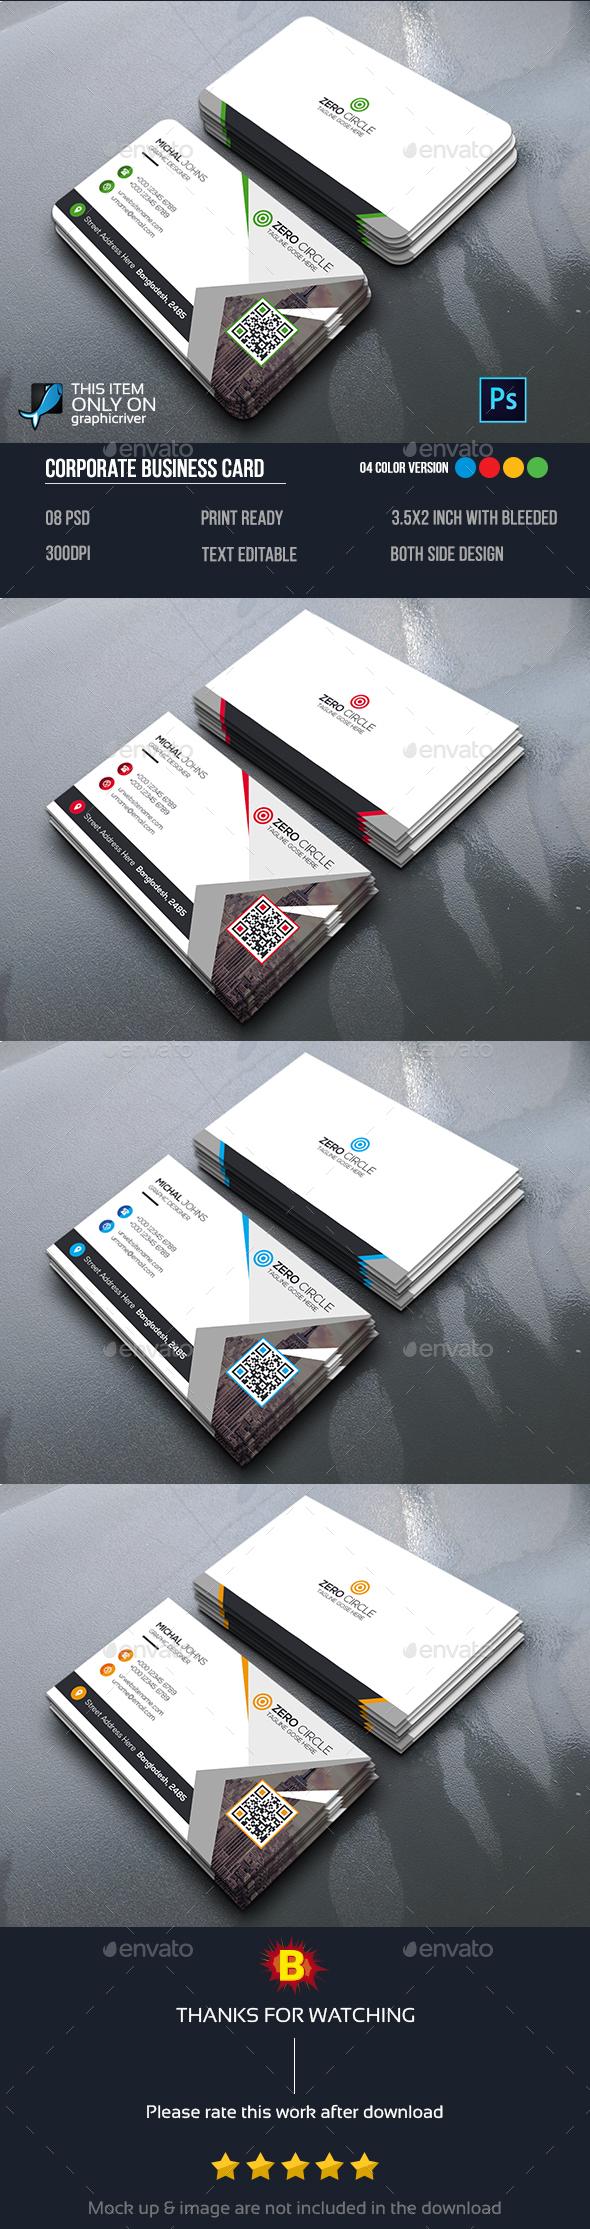 Mega corporate business card photography business card pinterest mega corporate business card reheart Choice Image